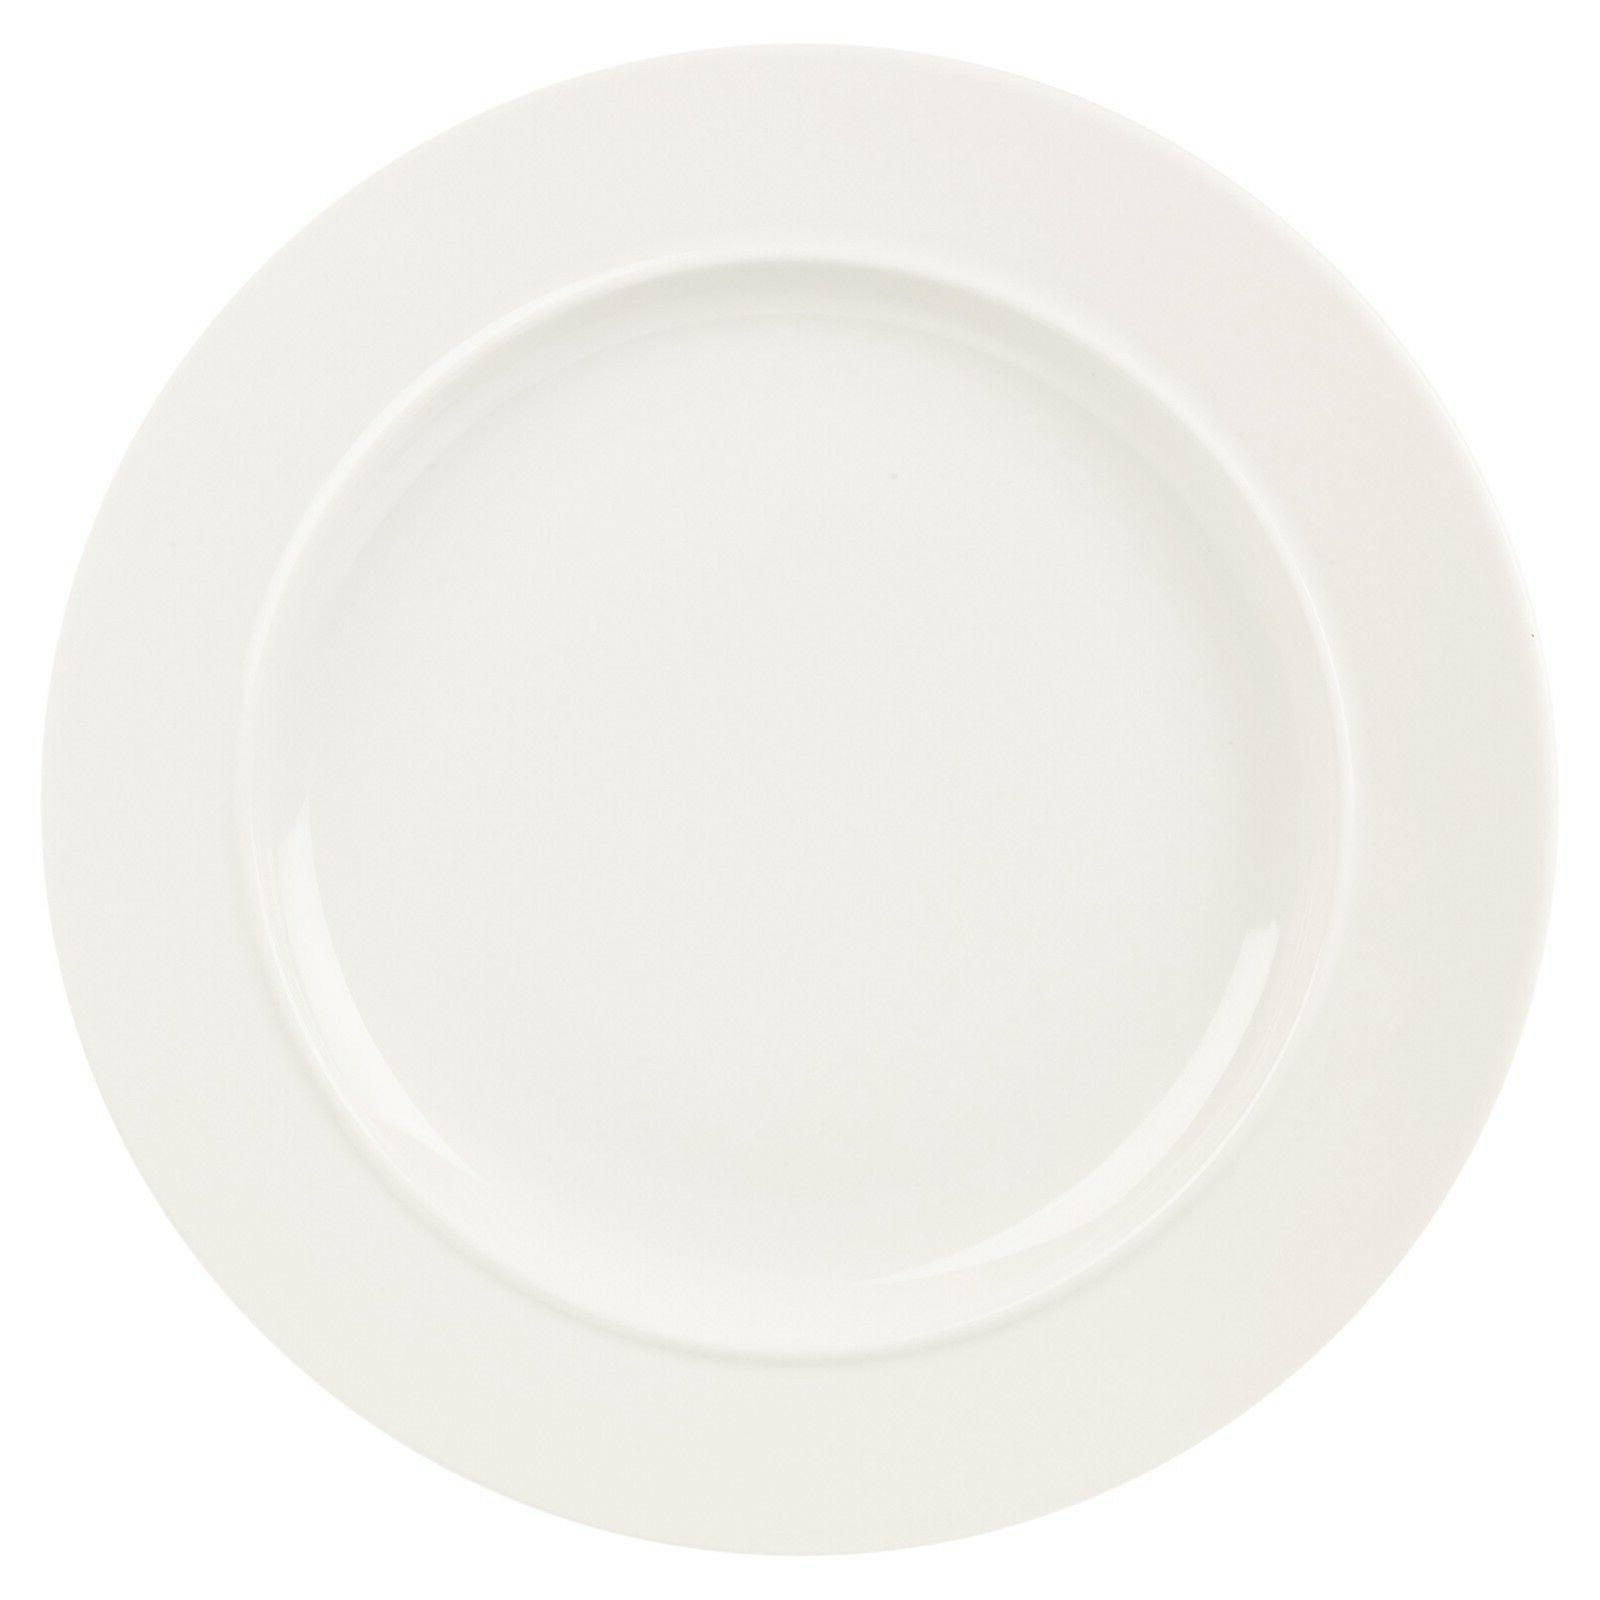 ALESSI Dinner Service Tableware Plate Bowl Mug Set